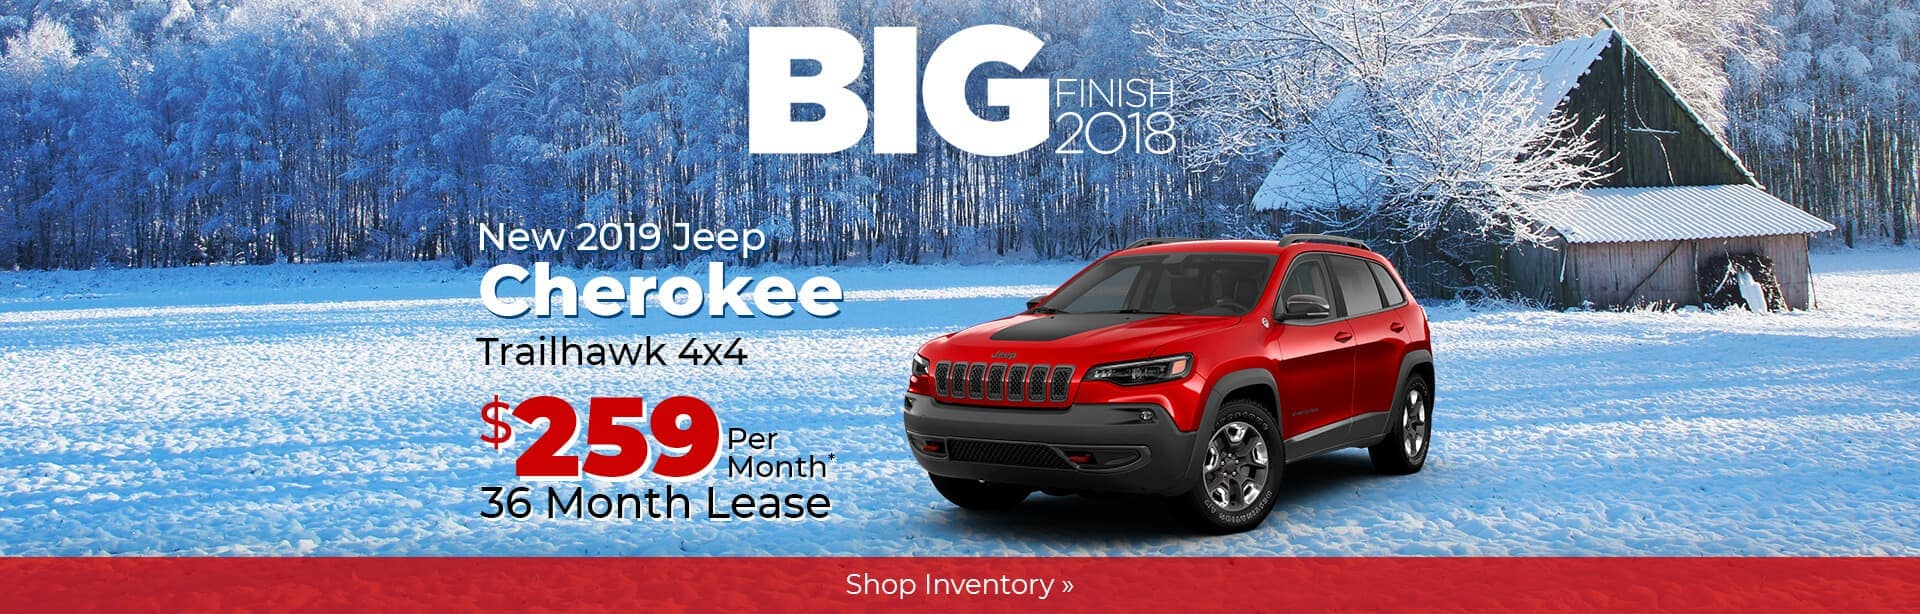 2019 Jeep Cherokee Trailhawk Big Finish Holiday Savings near Lafayette, Indiana.